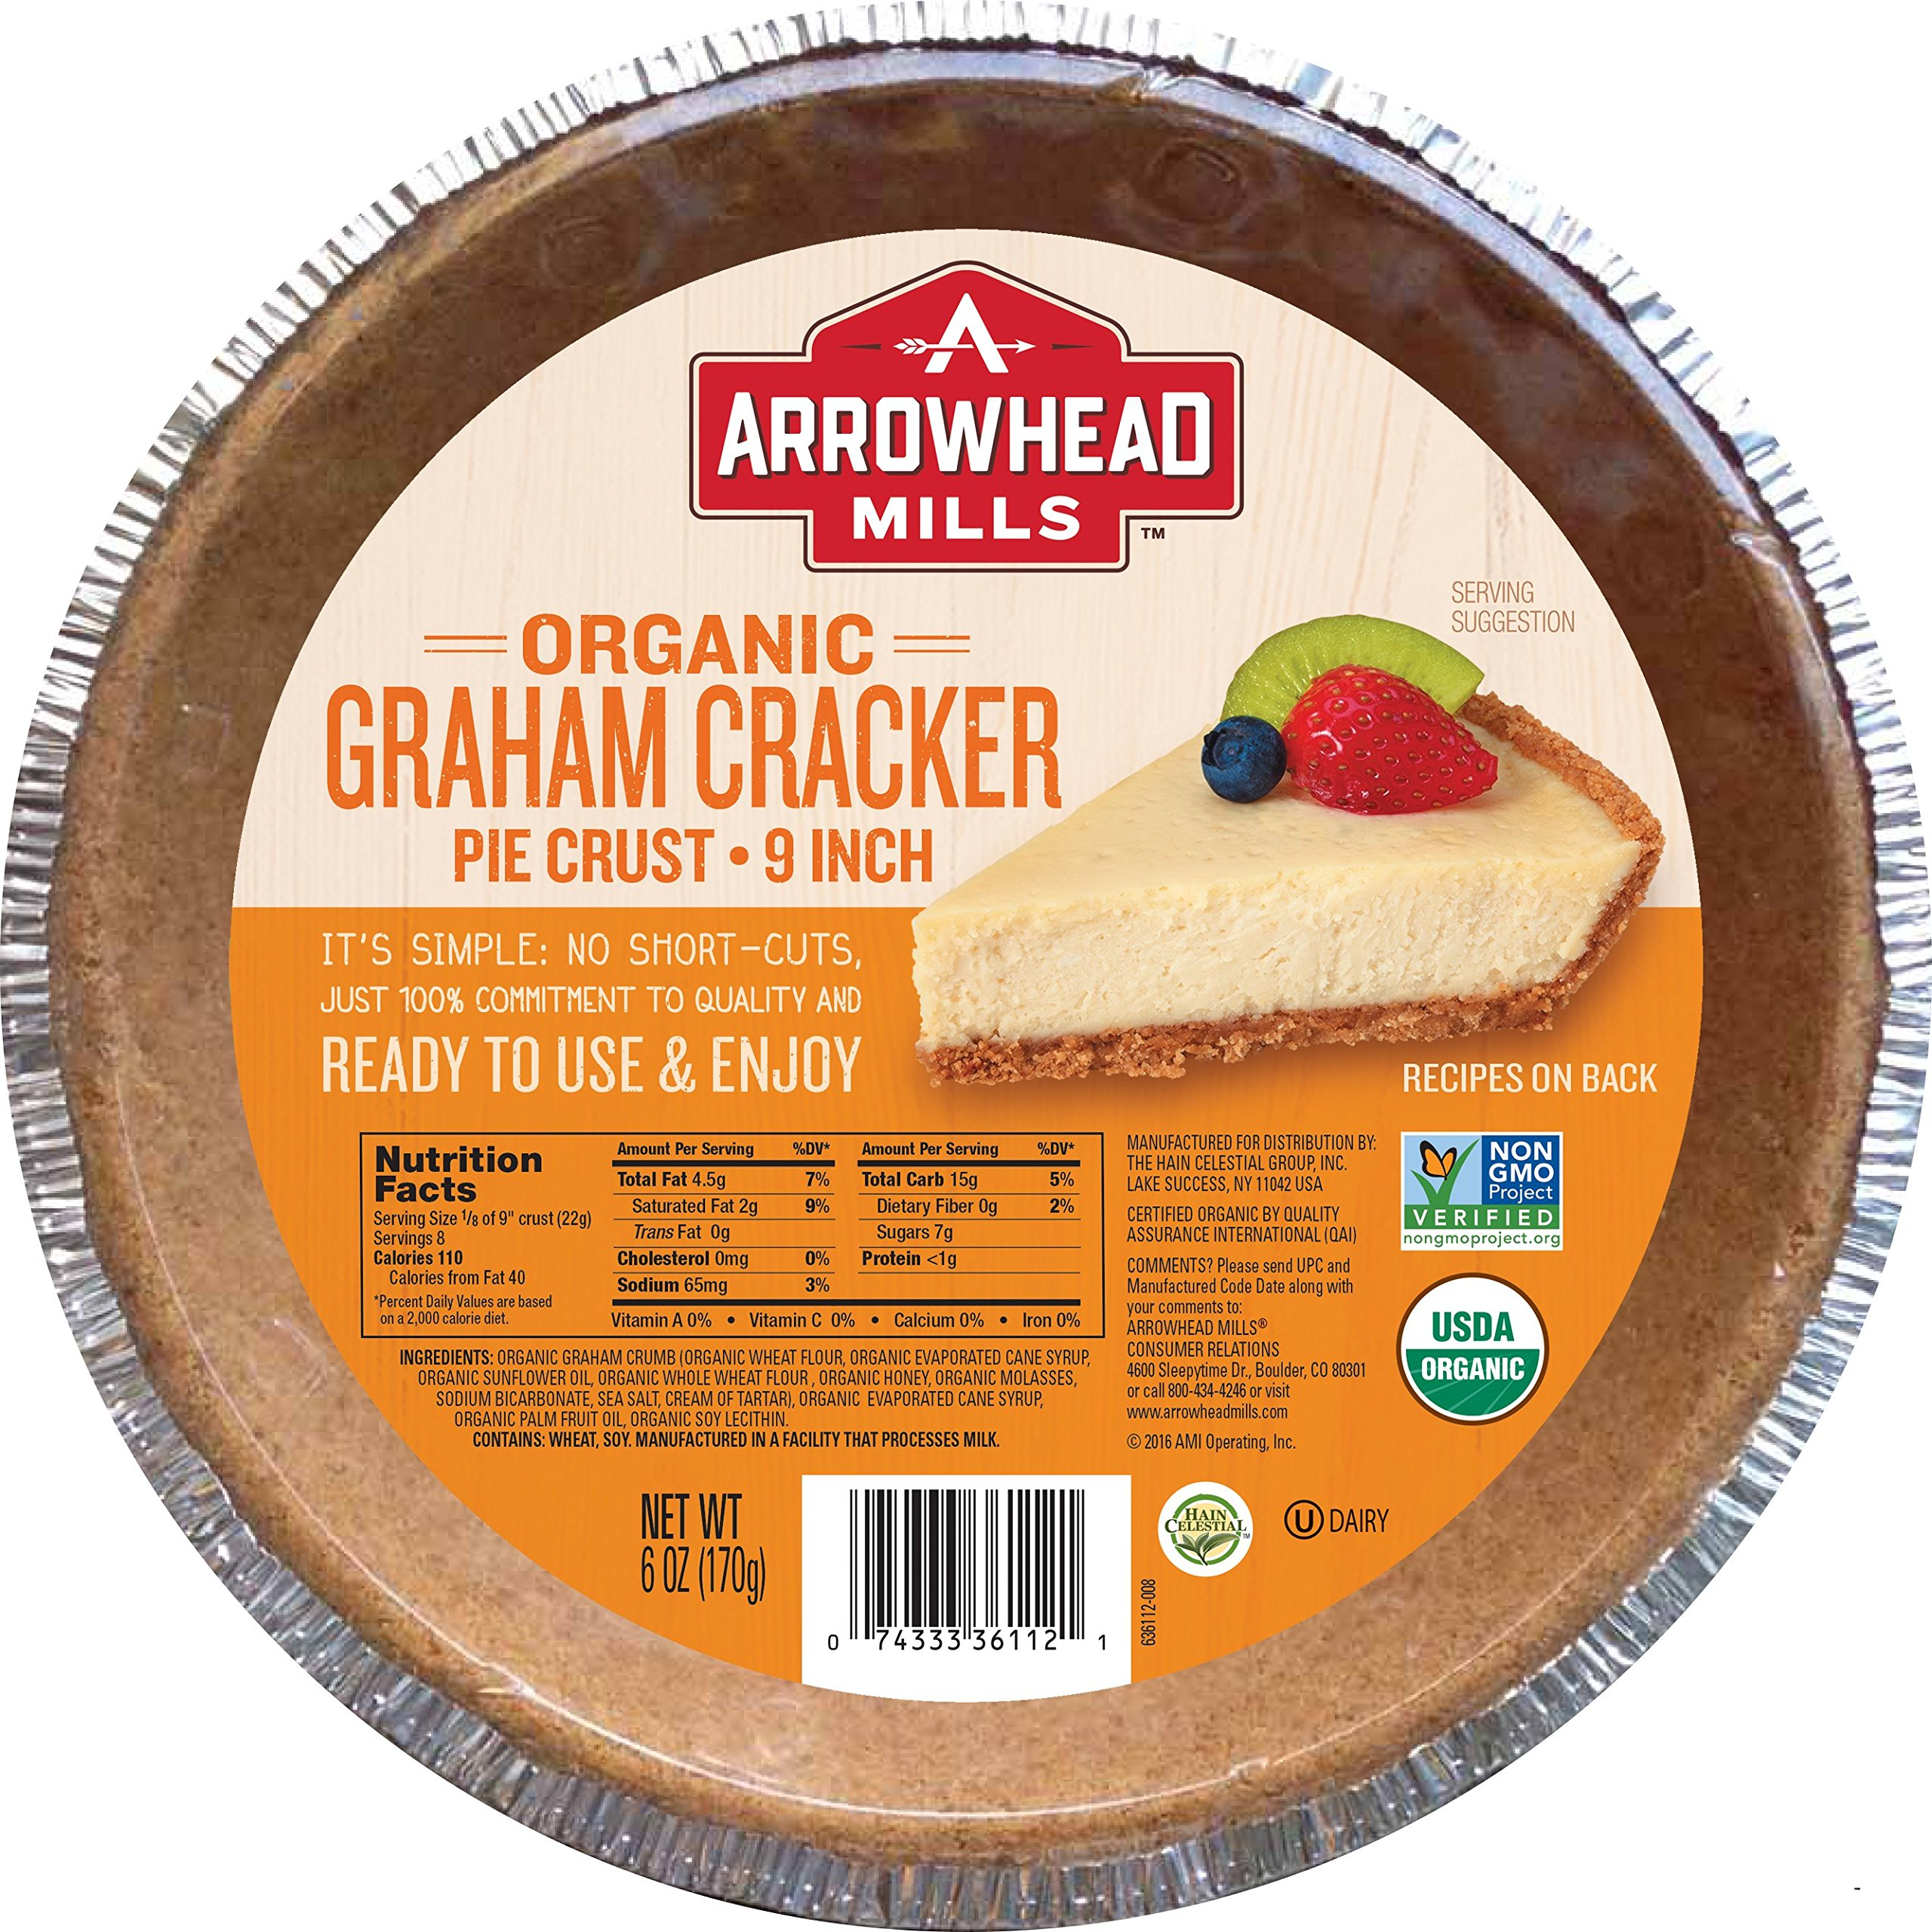 Arrowhead Mills Organic Graham Cracker Pie Crust, 9 Inch, 6 oz. (Pack of 12)